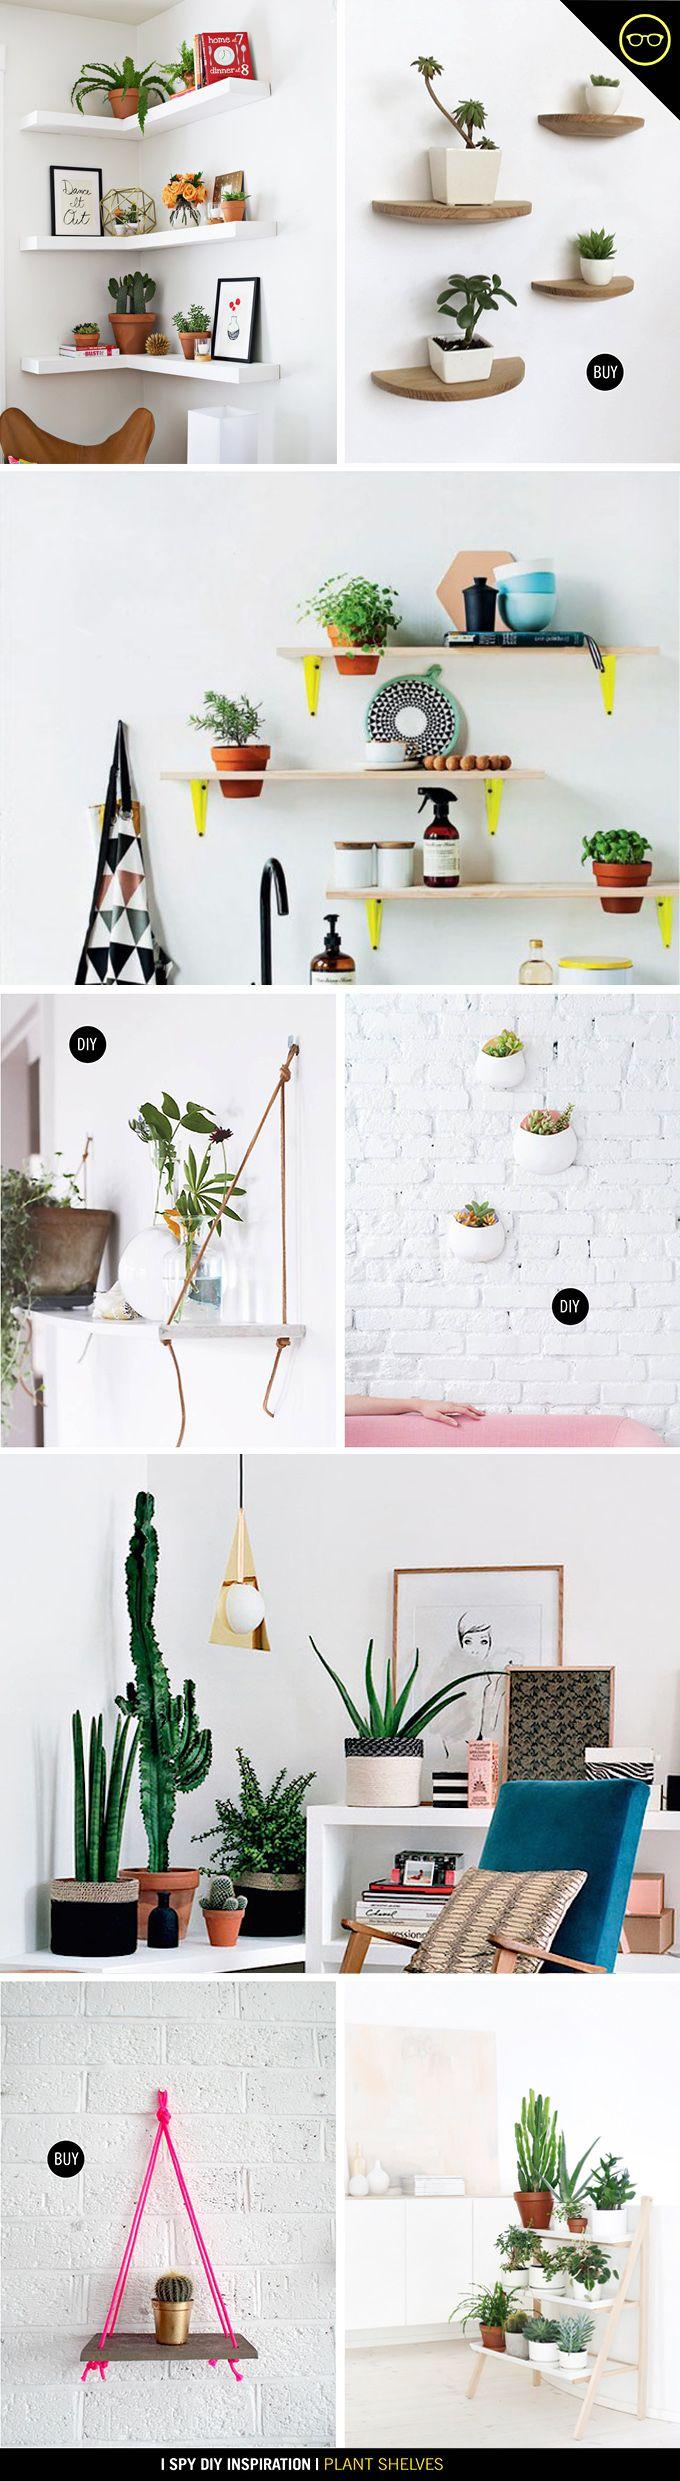 Inspiration plant shelves i spy diy for the home pinterest